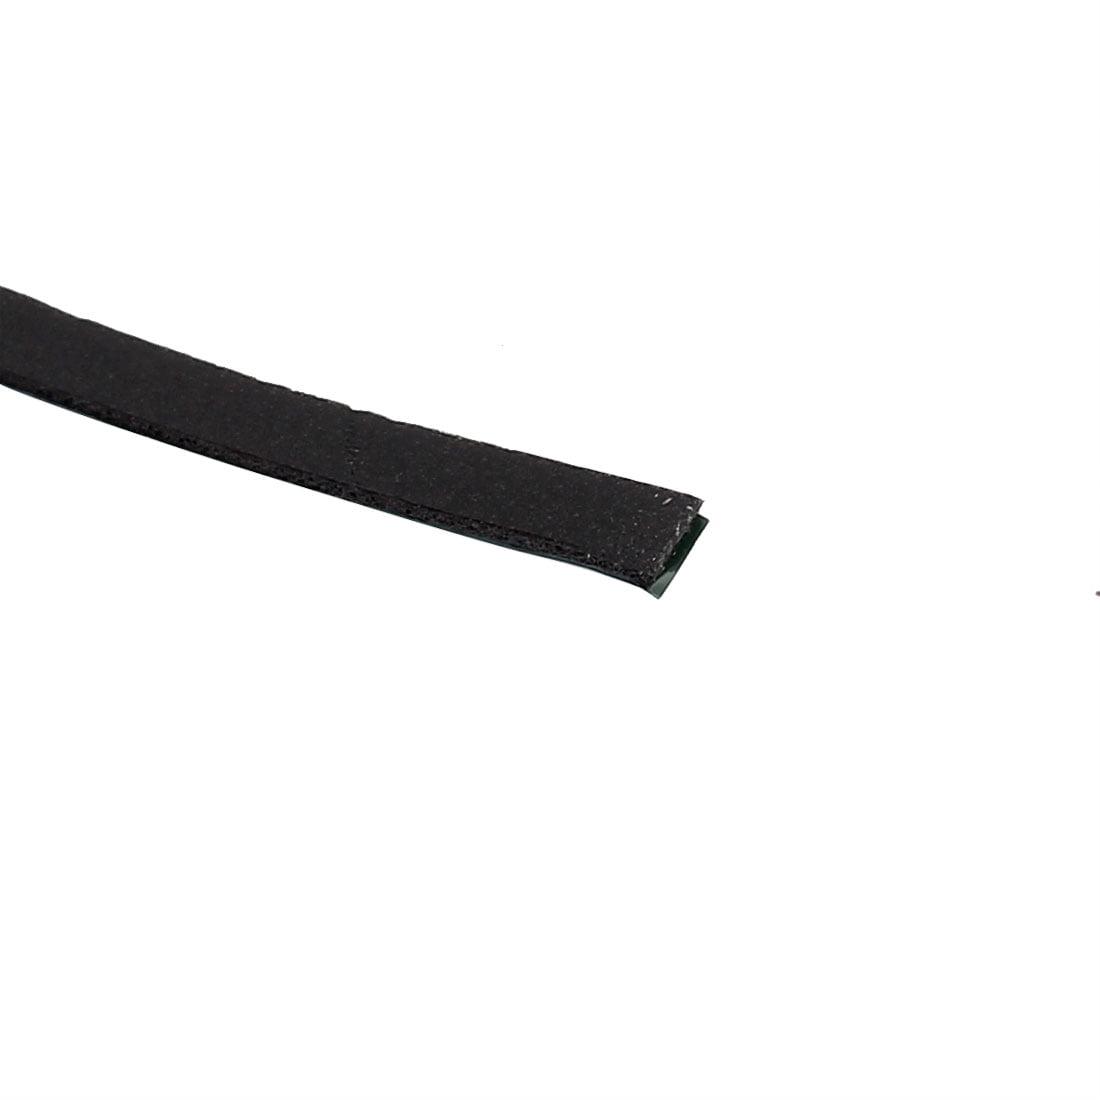 2pcs 10M x 3mm x 0.5mm Dual-side Adhesive Shockproof Sponge Foam Tape Green - image 1 de 3